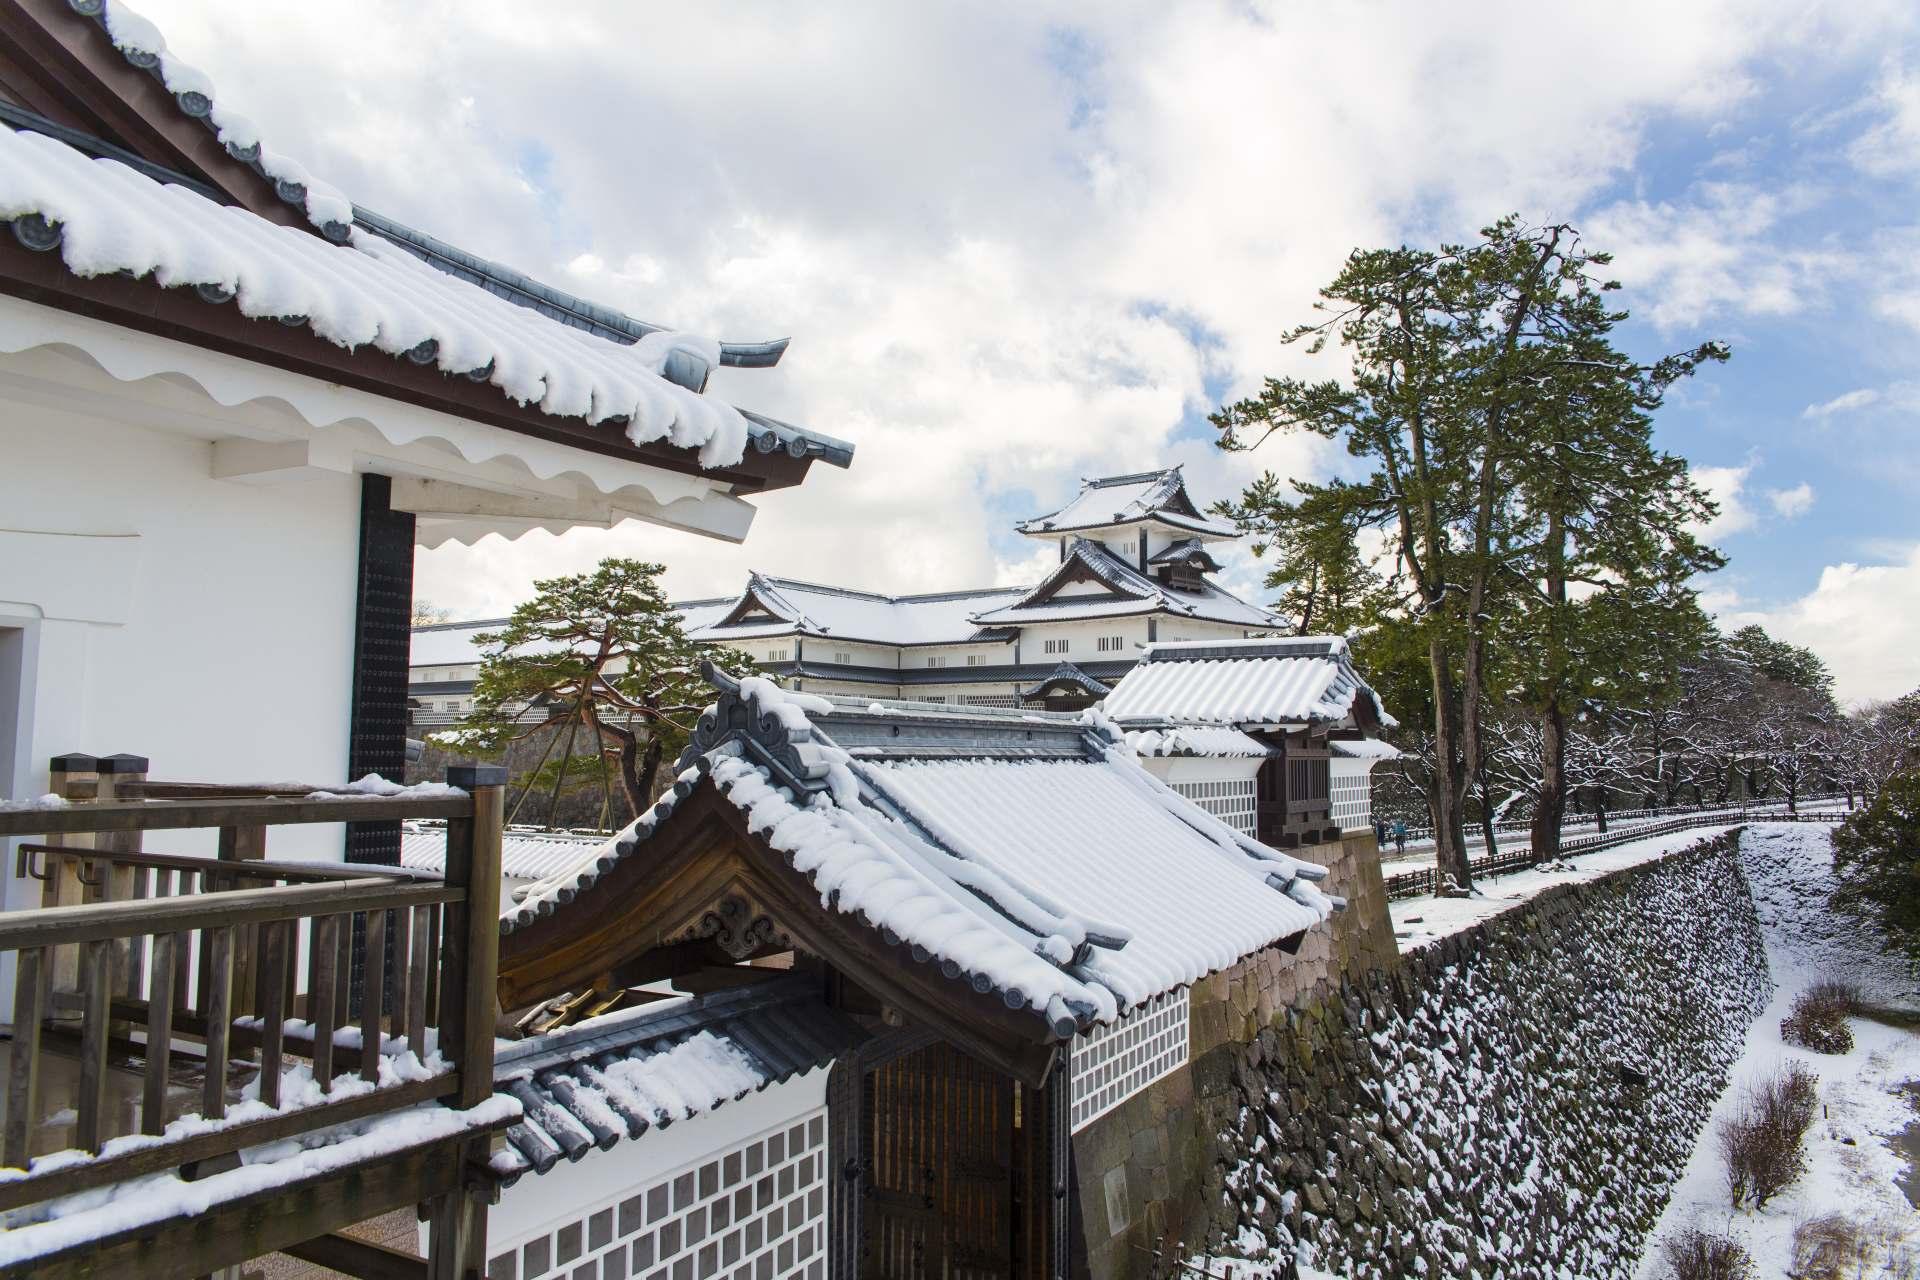 Kanazawa Castle is set off by the snowscape